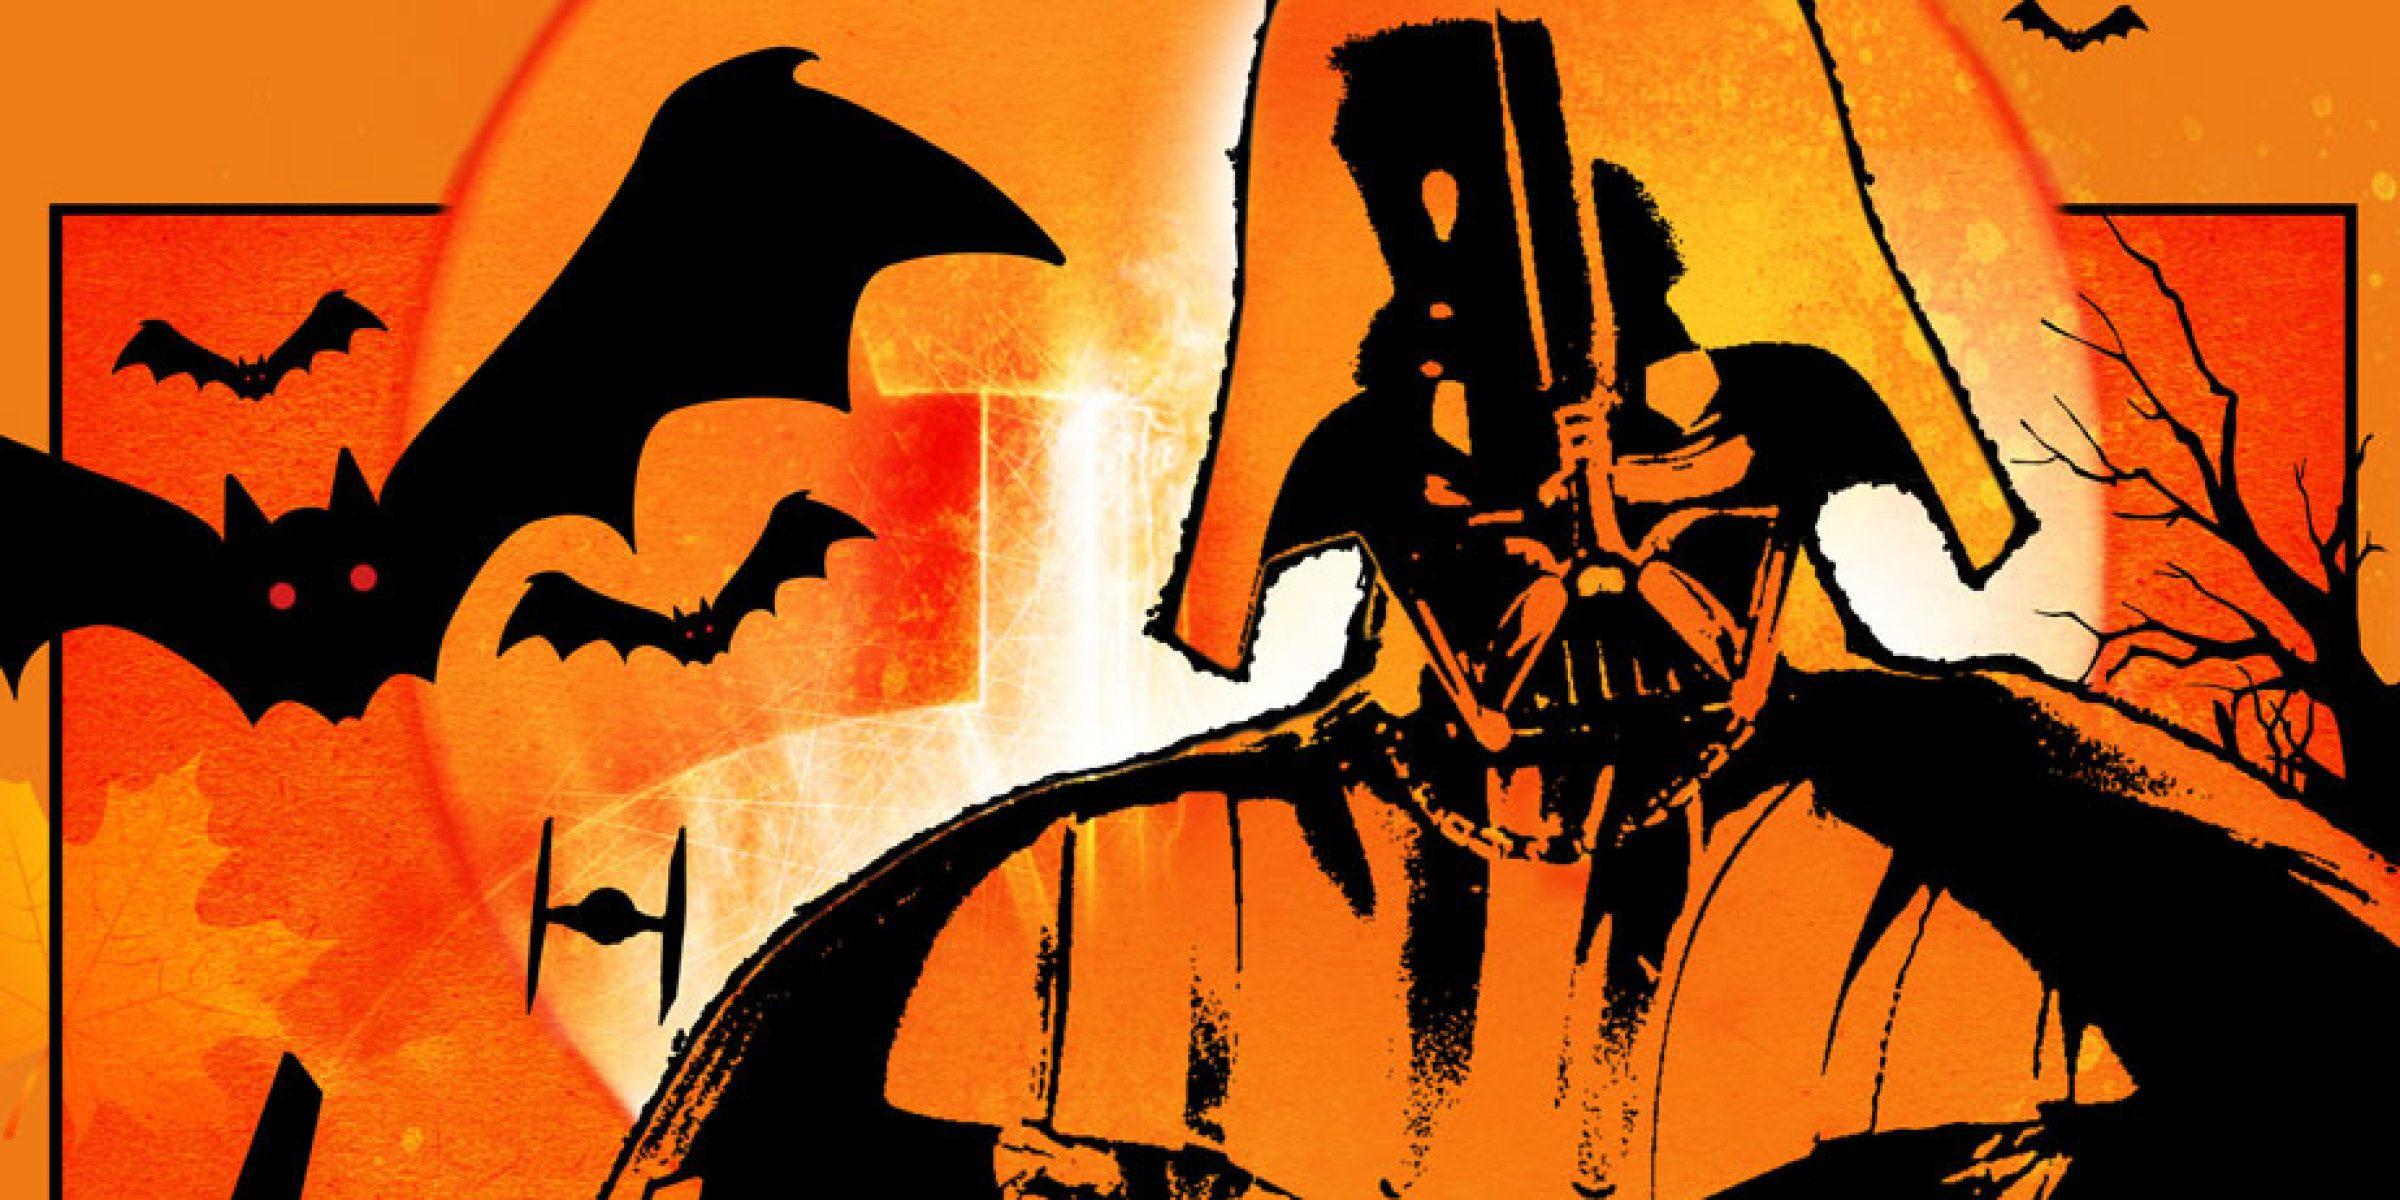 Most Inspiring Wallpaper Halloween Star Wars - 3ba74d9550fbb8b3f2598a46106b6f95  Collection_76755.jpg